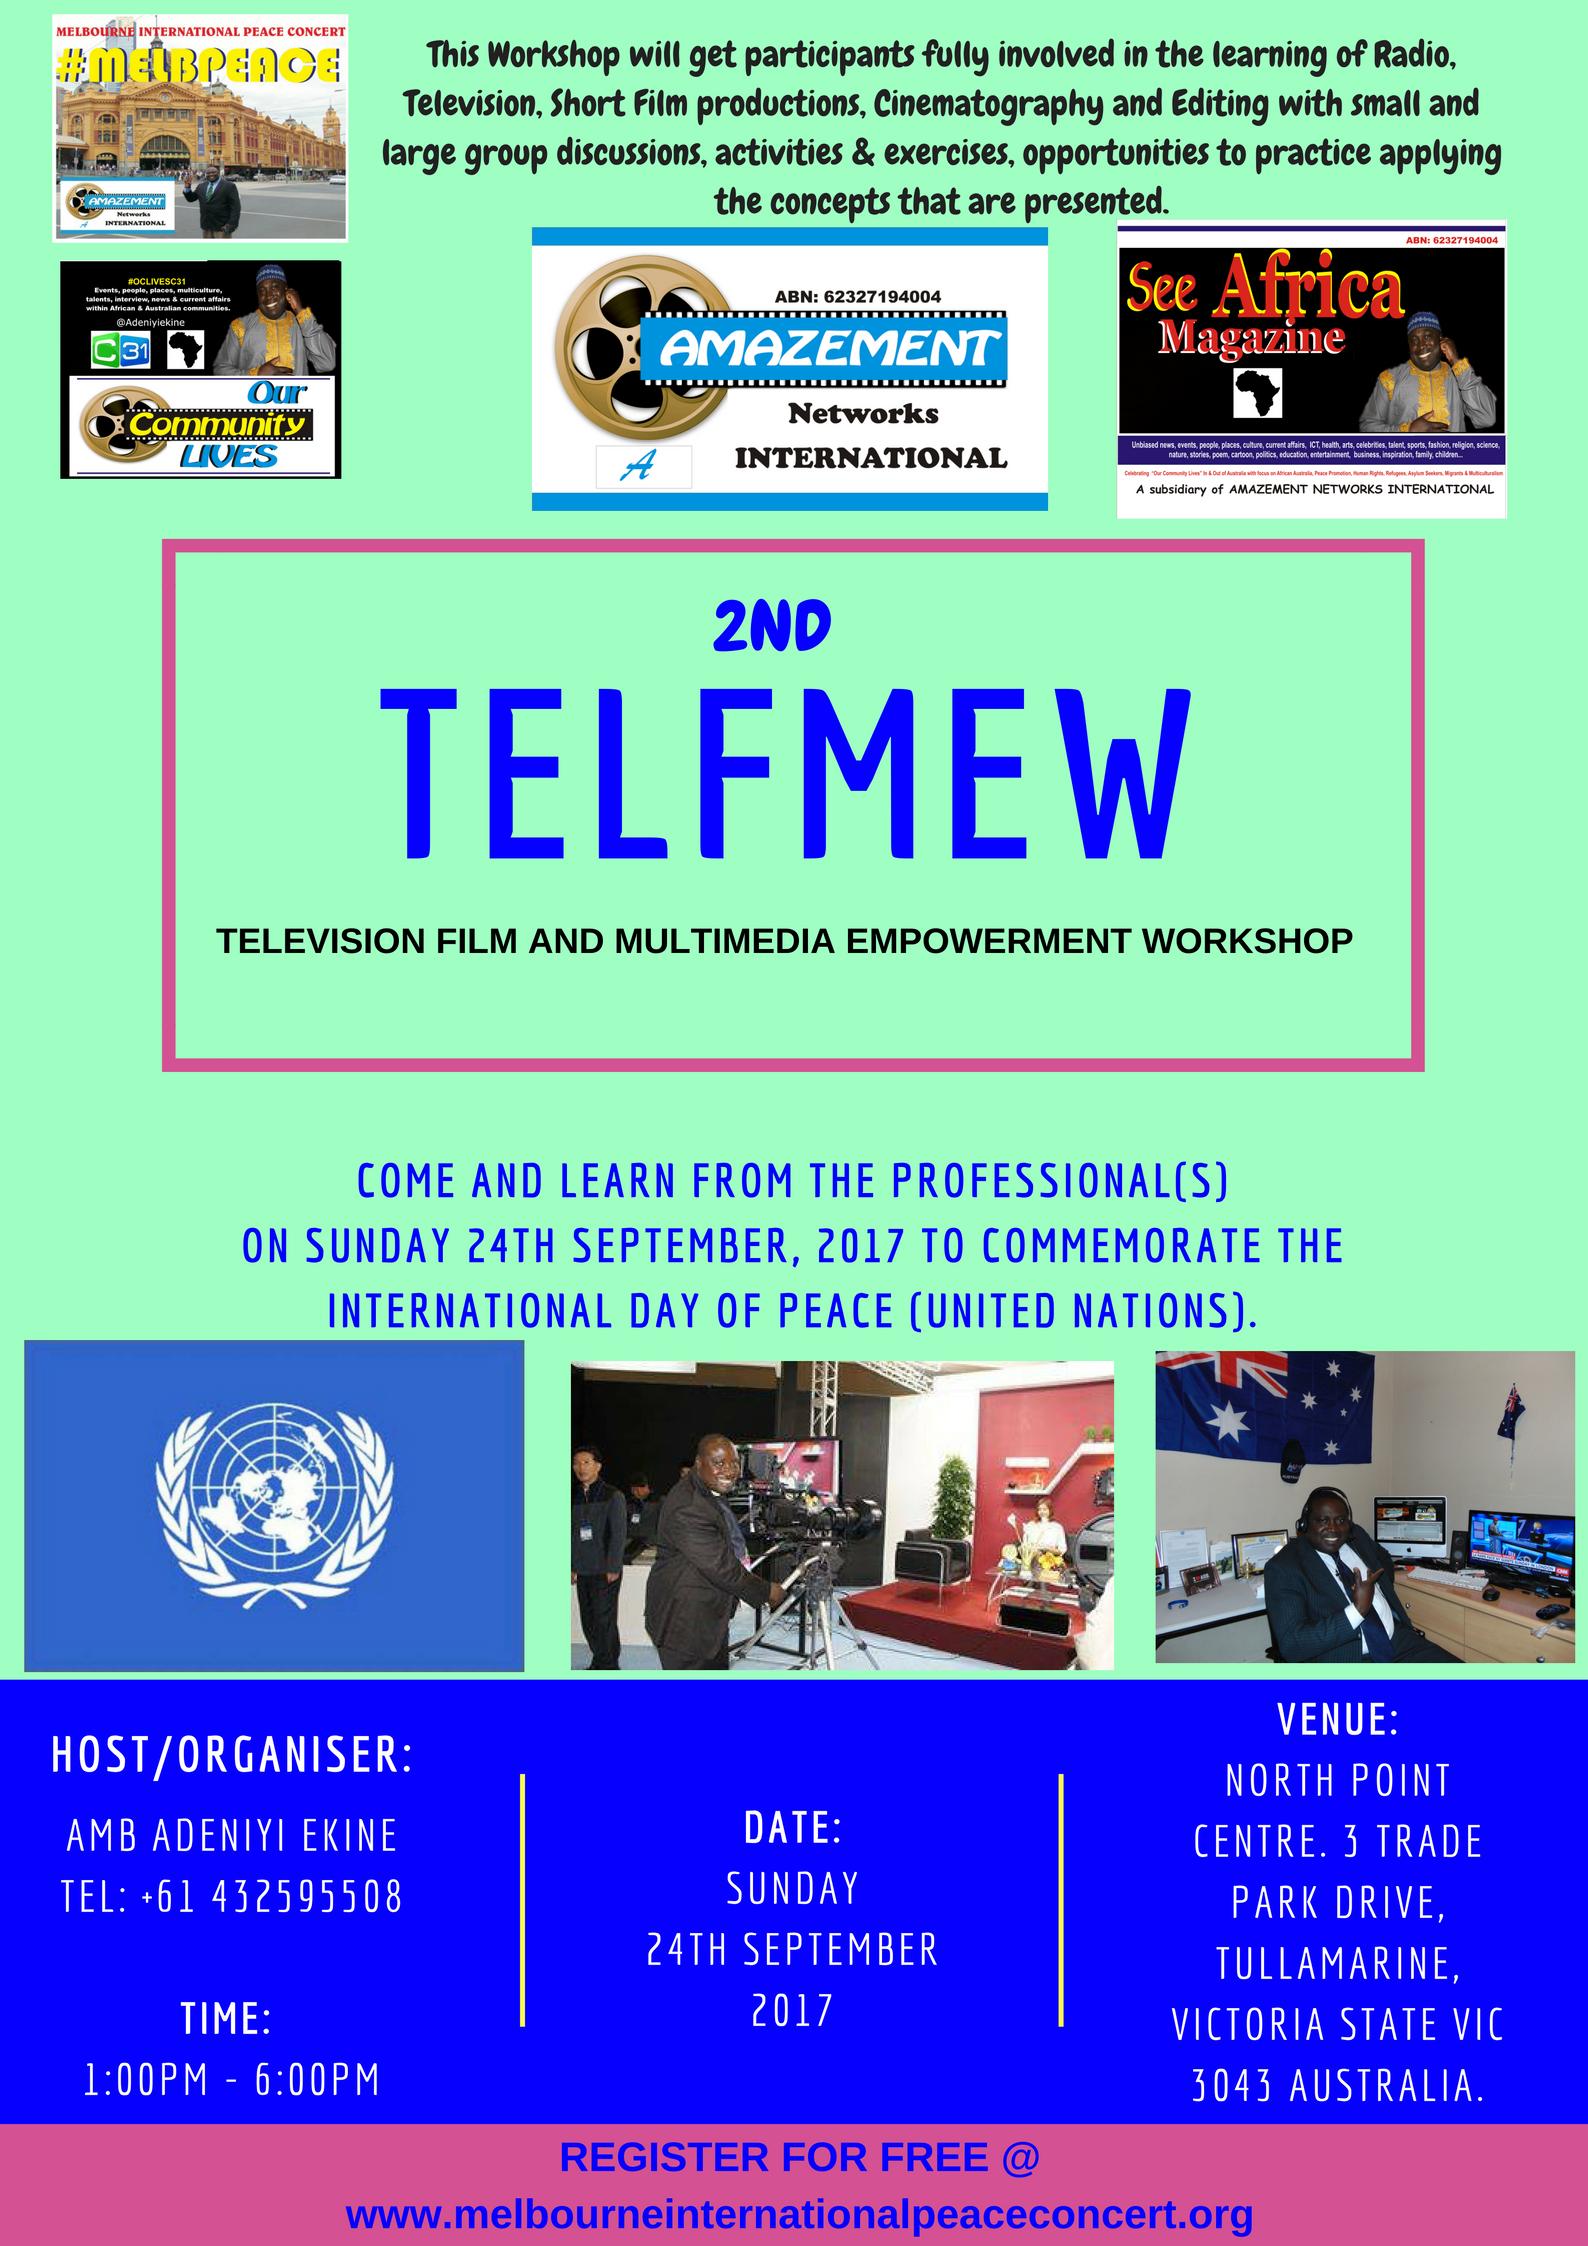 2nd TELFMEW on Sunday 24th September 2017